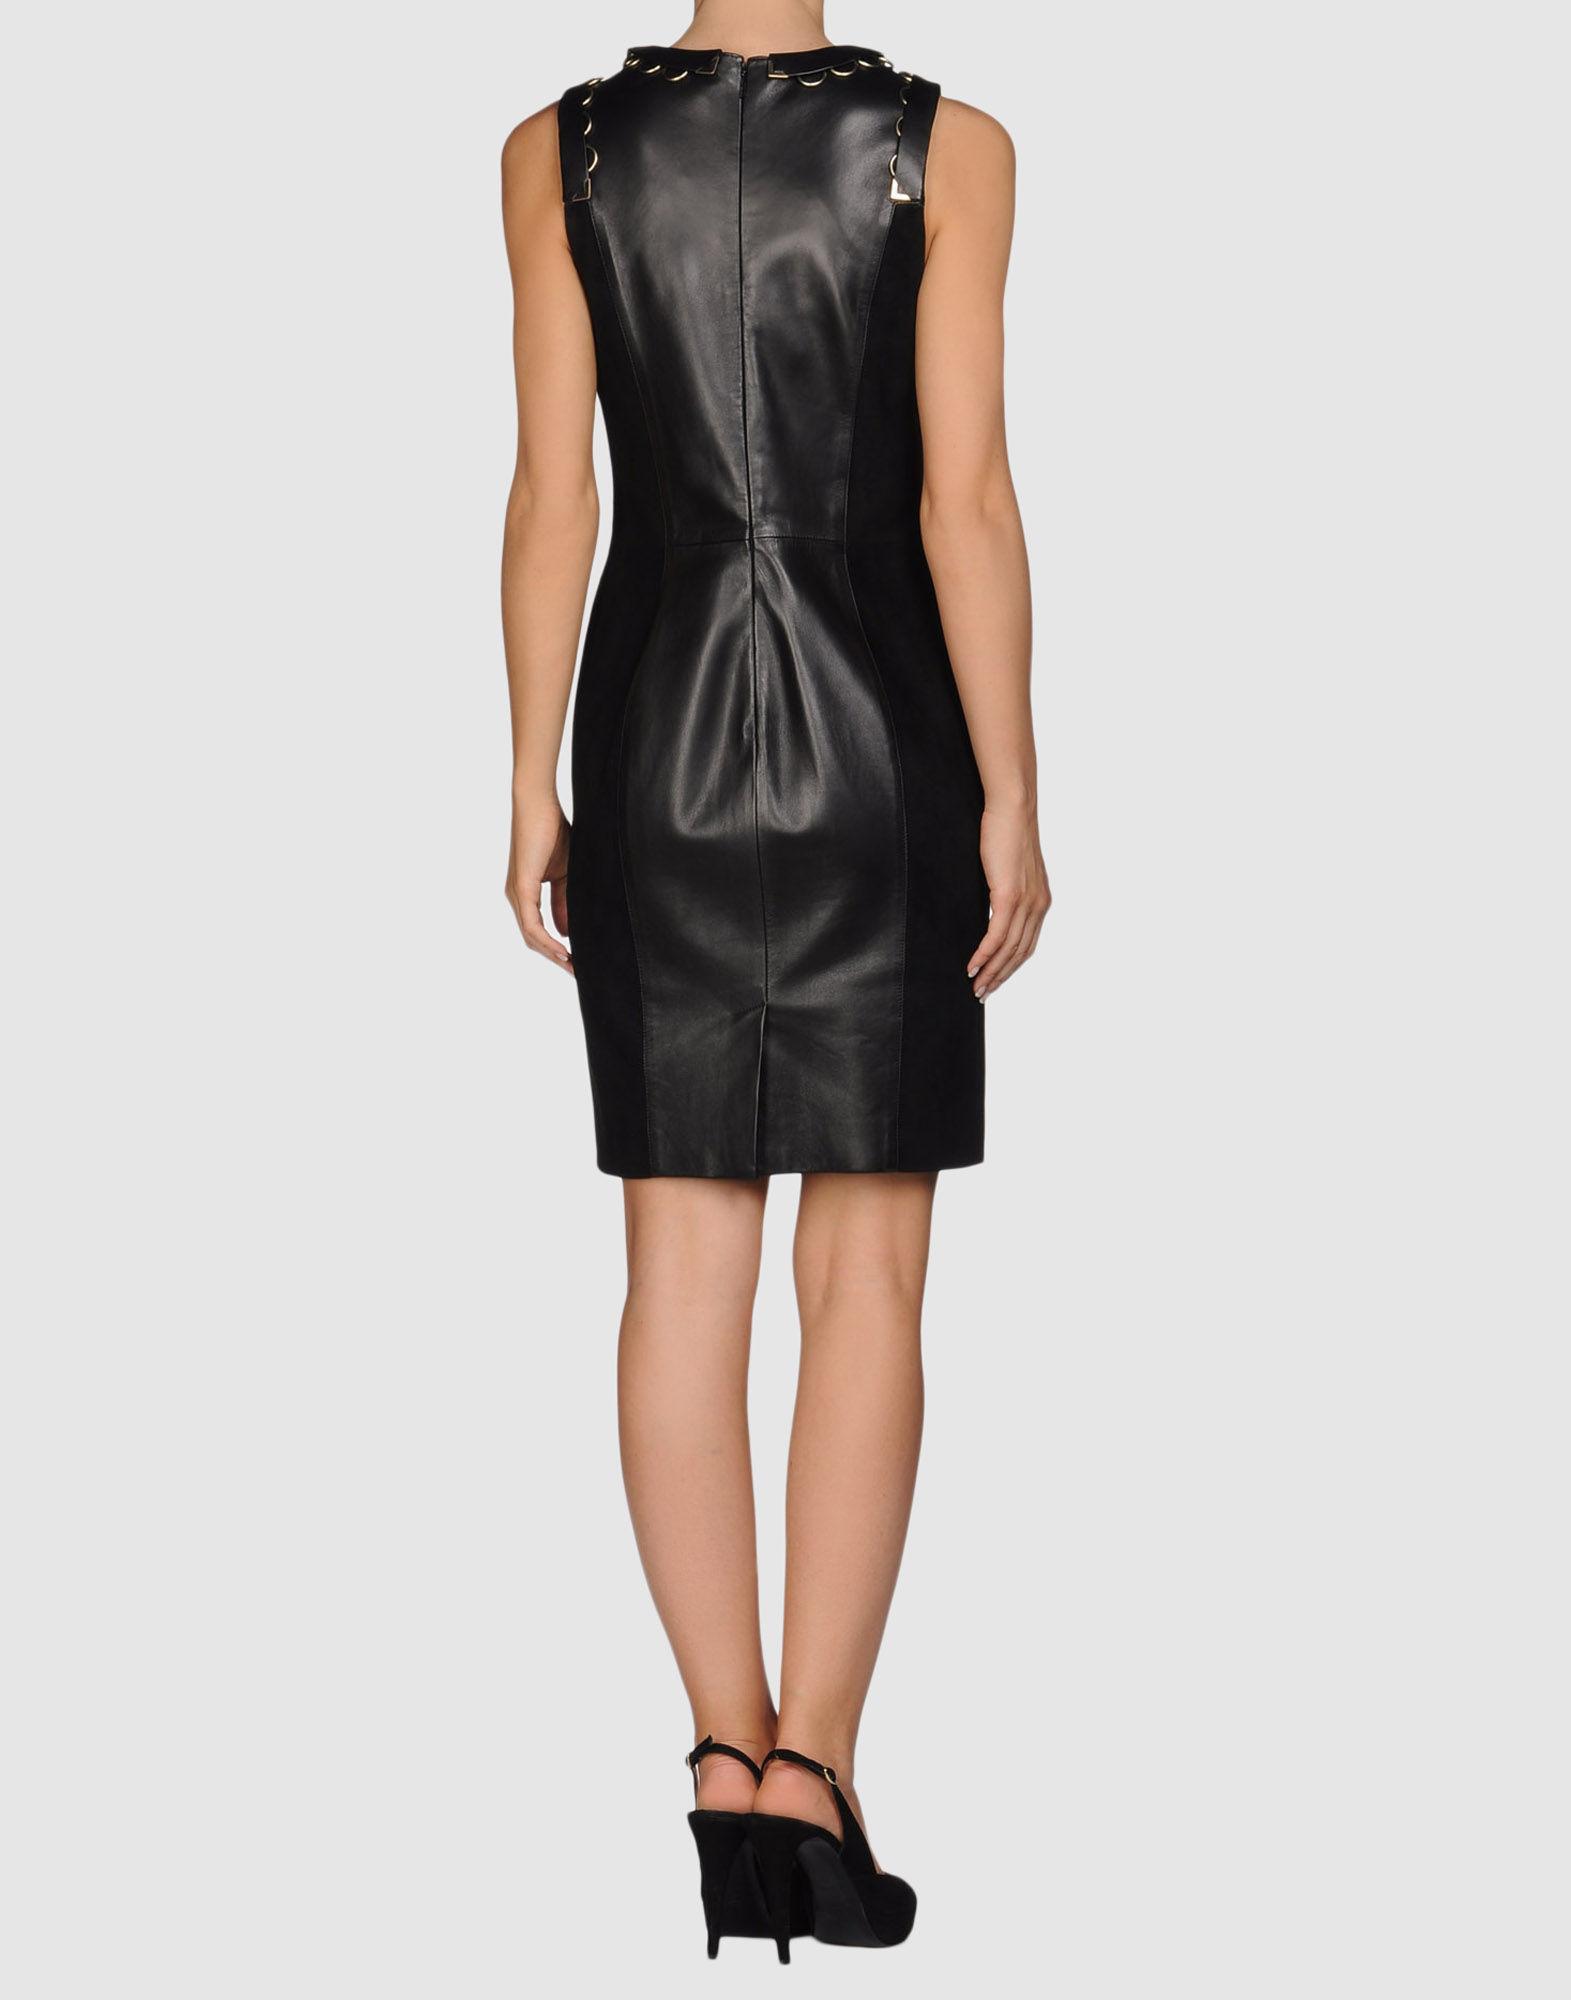 34225016BM 14 r - Evening Φορεματα Versace 2011 2012 Κωδ.04